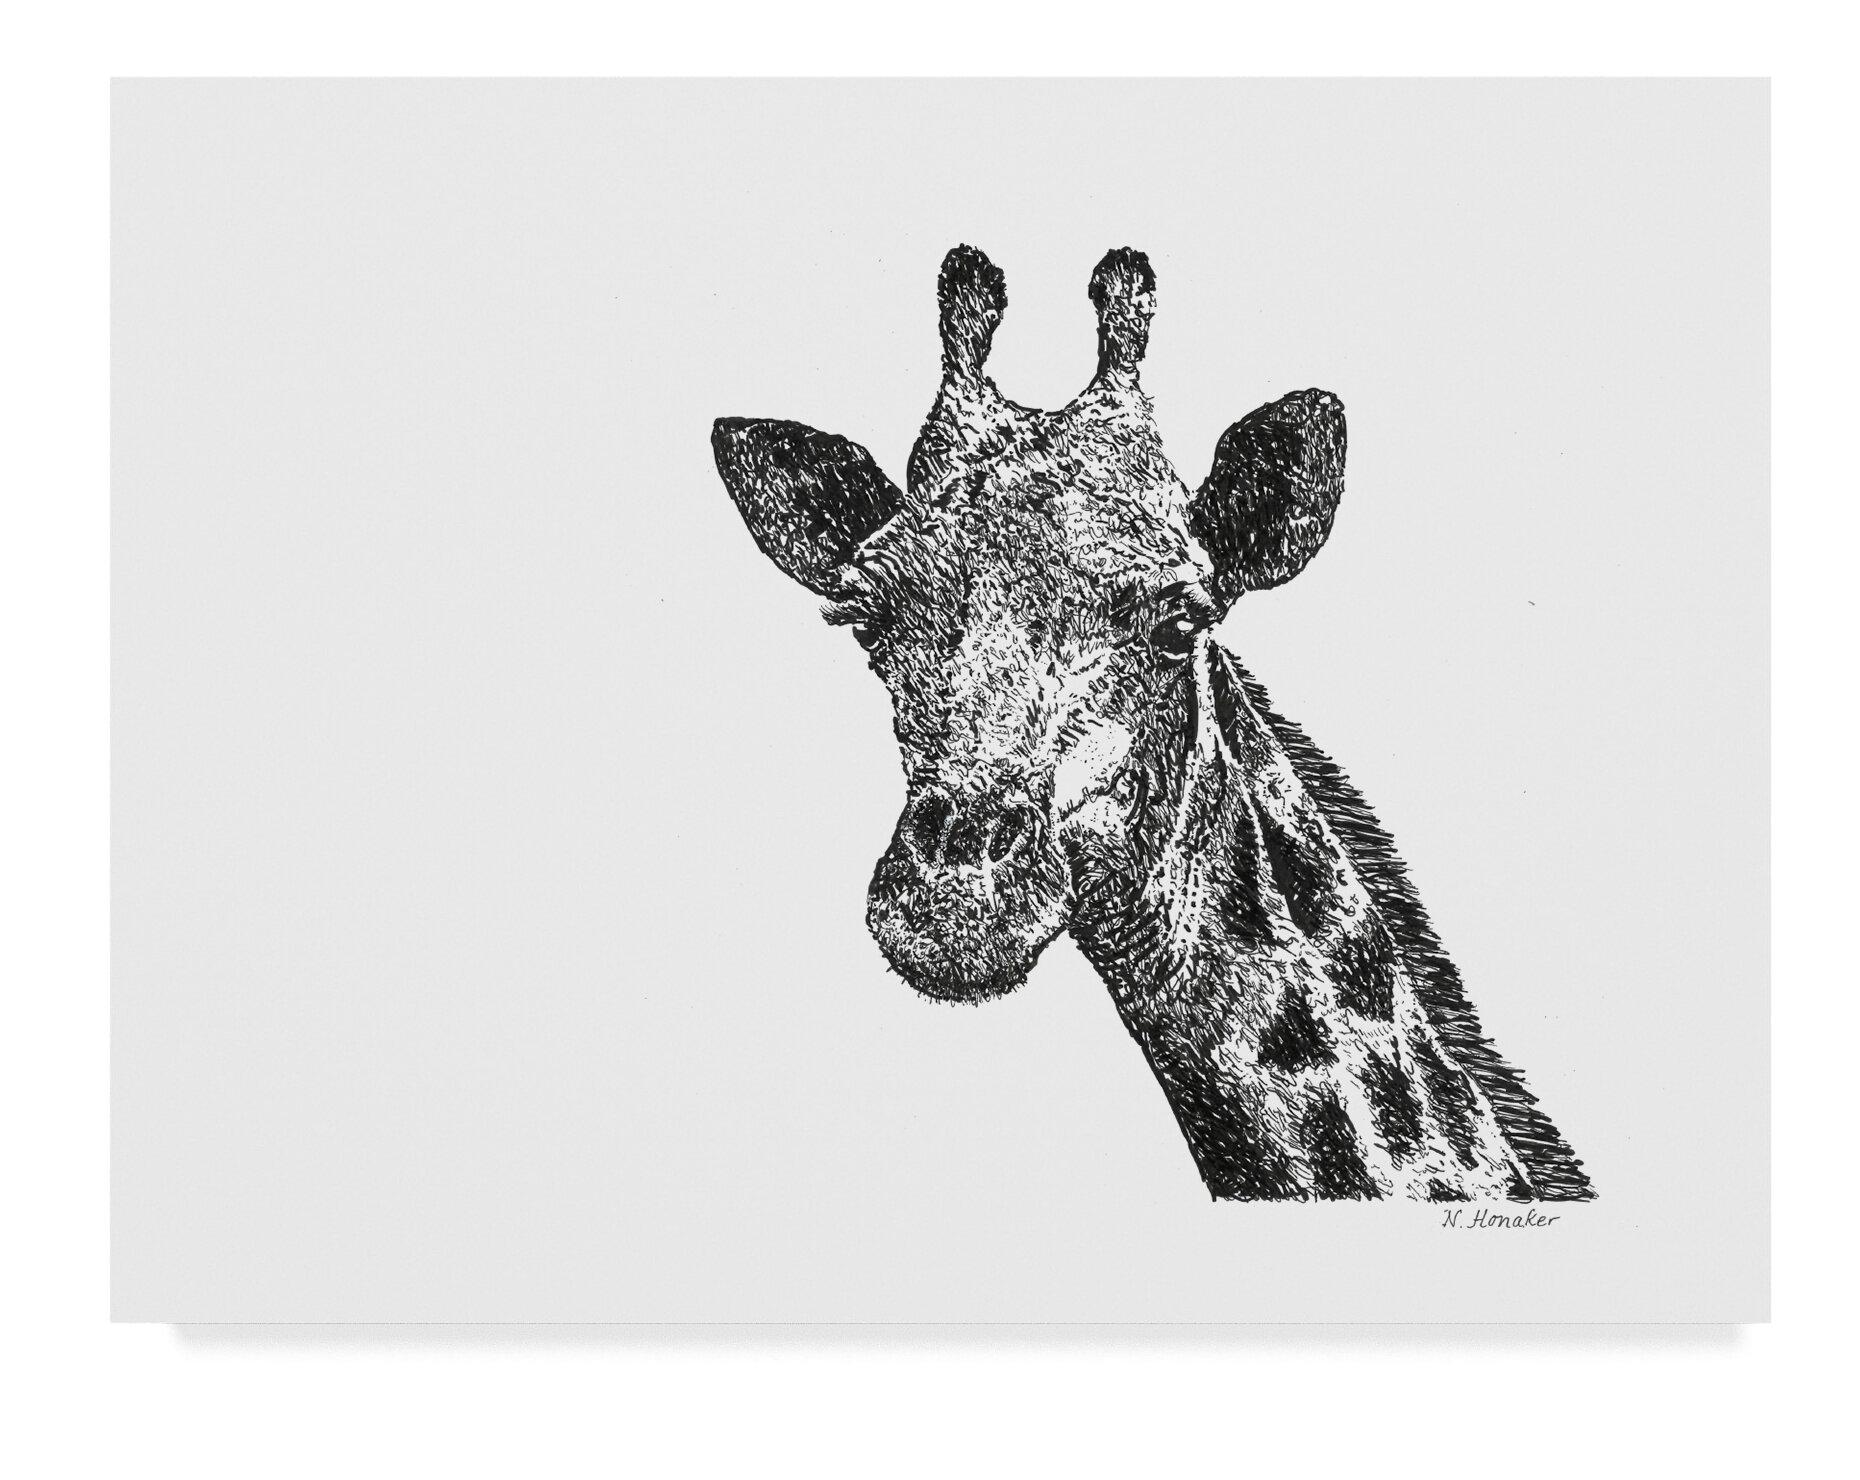 East Urban Home Giraffe Line Art Graphic Art Print On Wrapped Canvas Wayfair